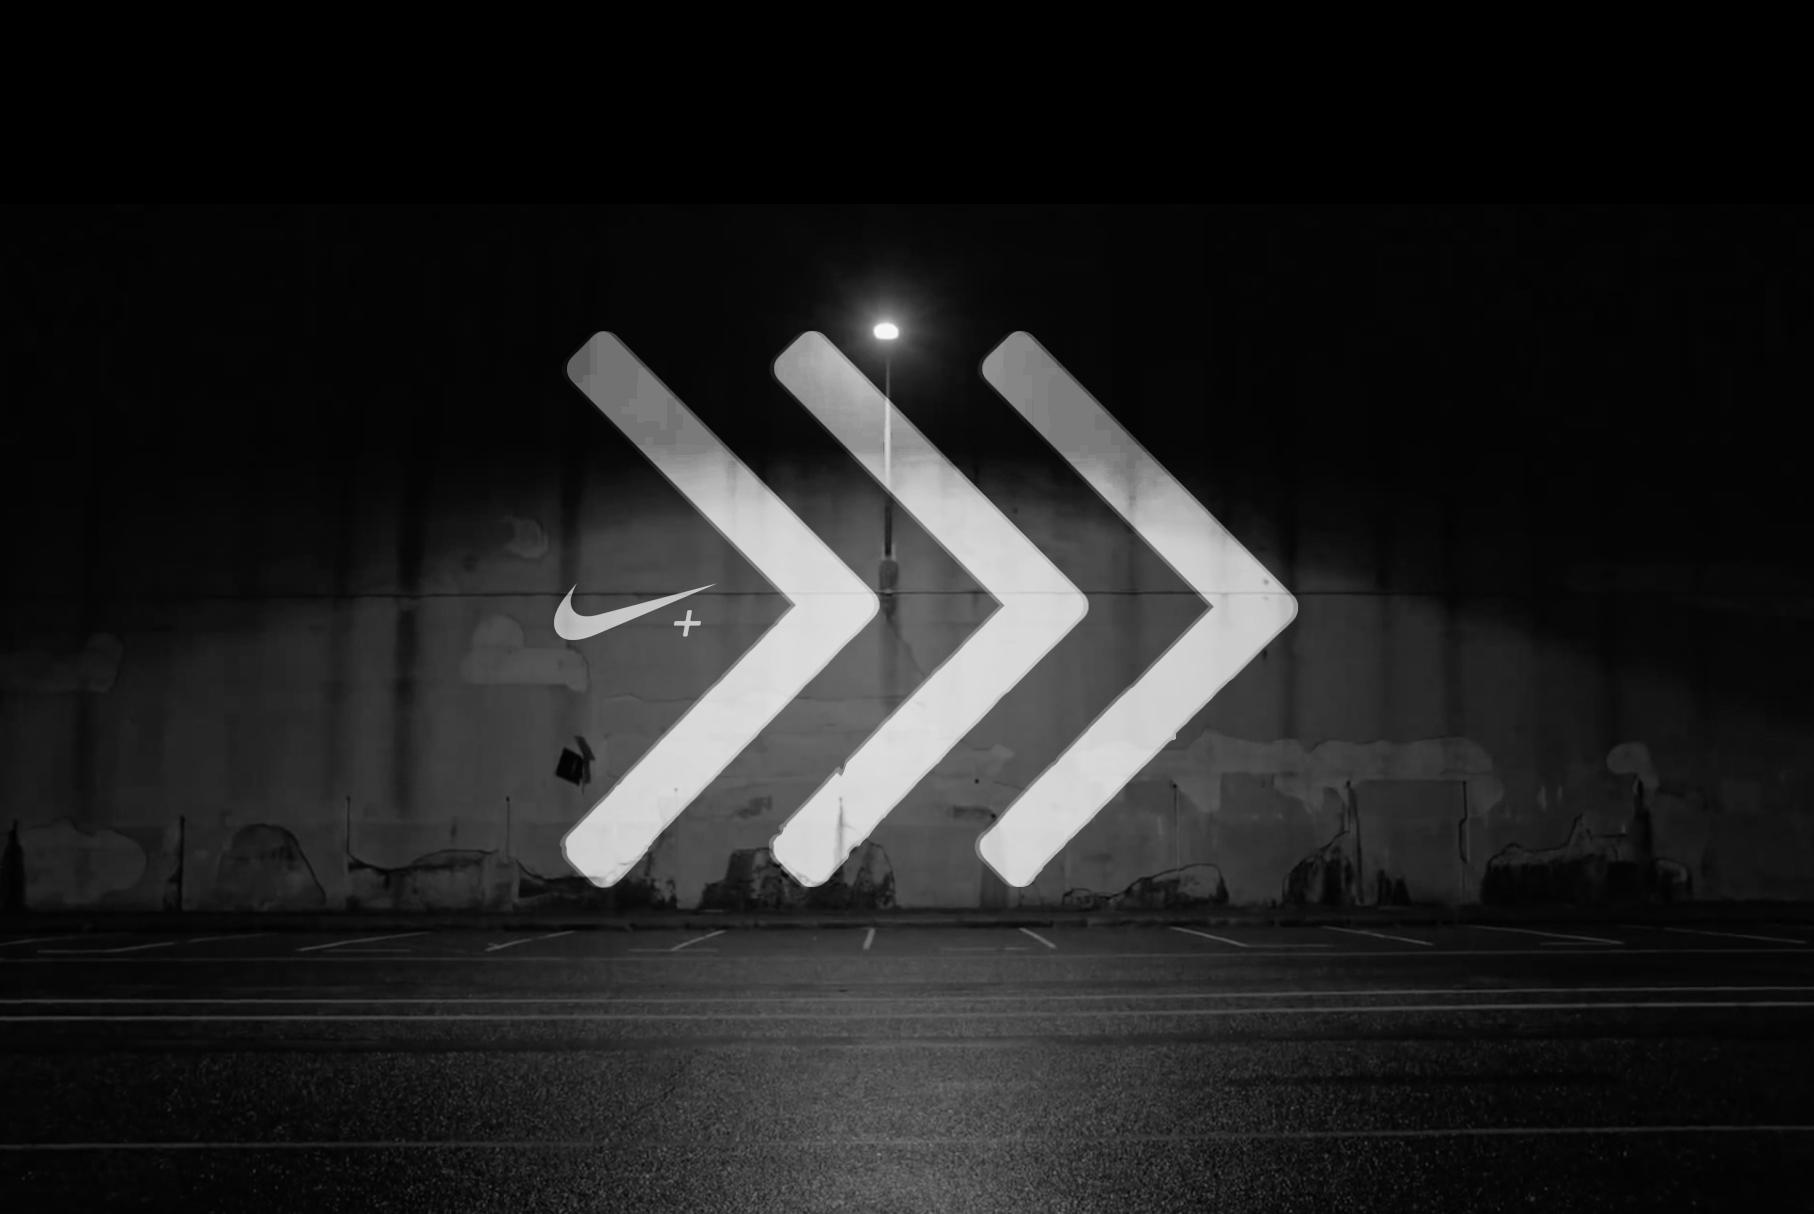 Monarquía lana Penélope  Nike After Dark - Théo Dufaÿ